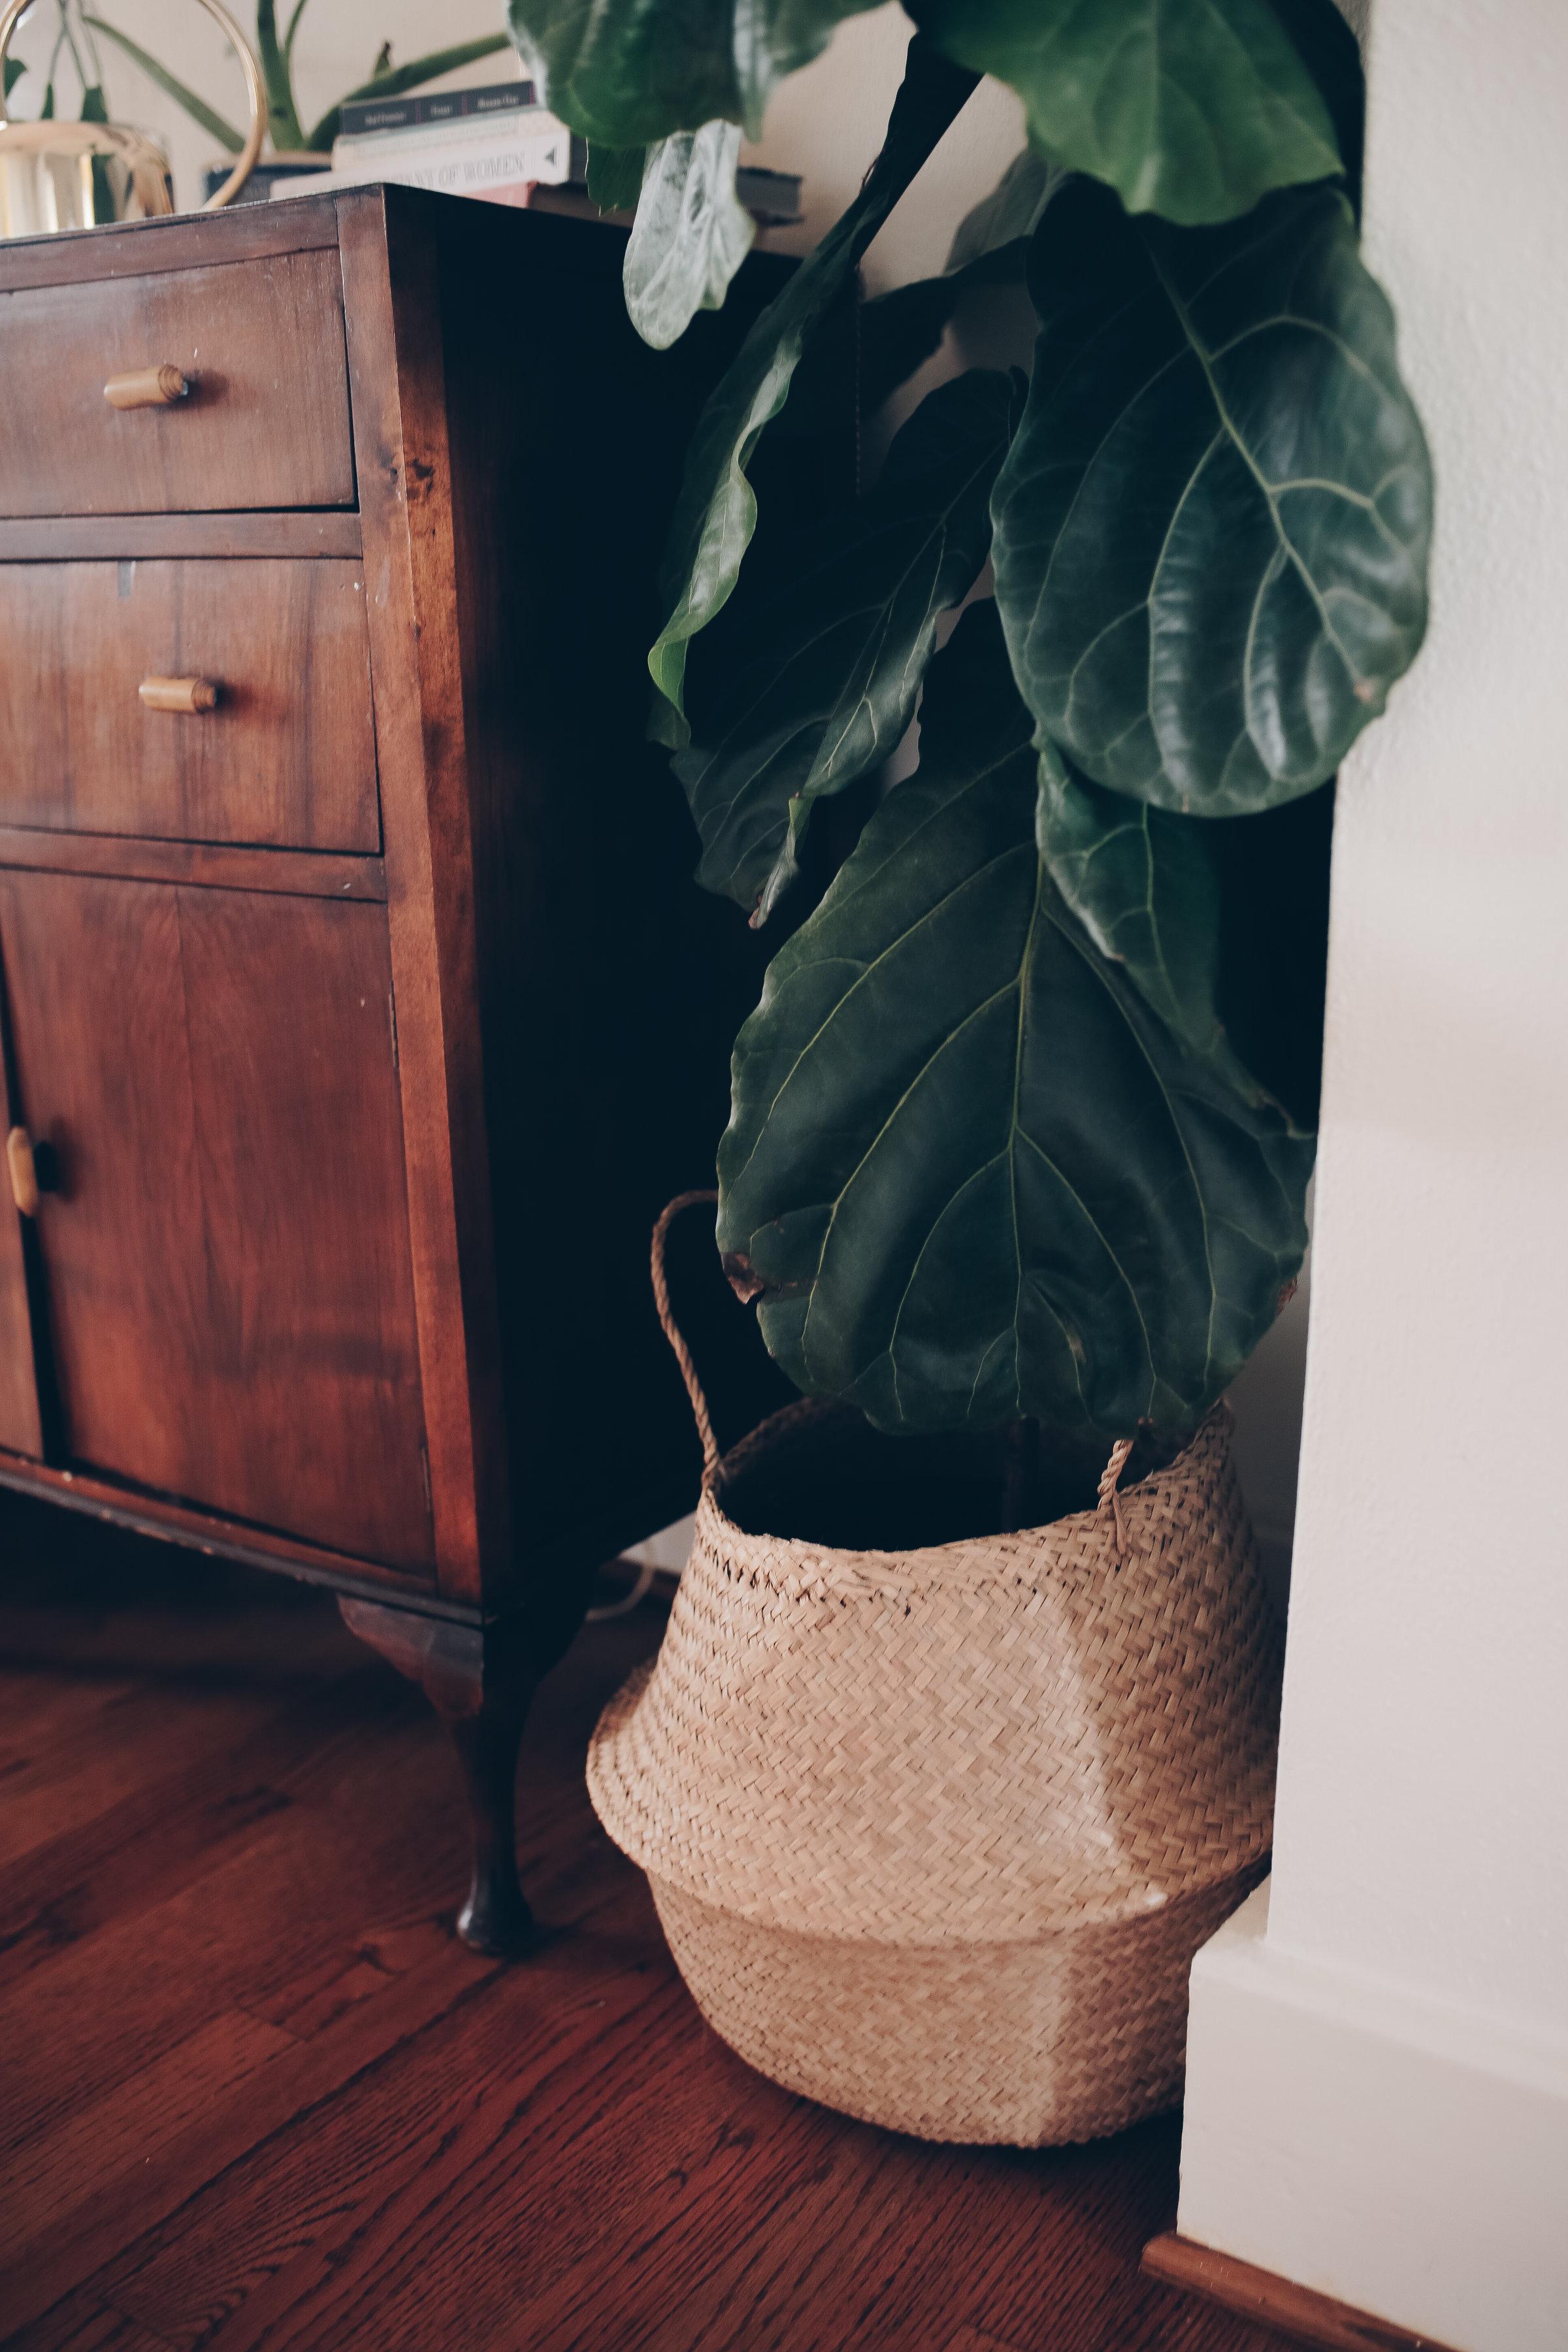 boho home decor with indoor plants from livingforaged.com